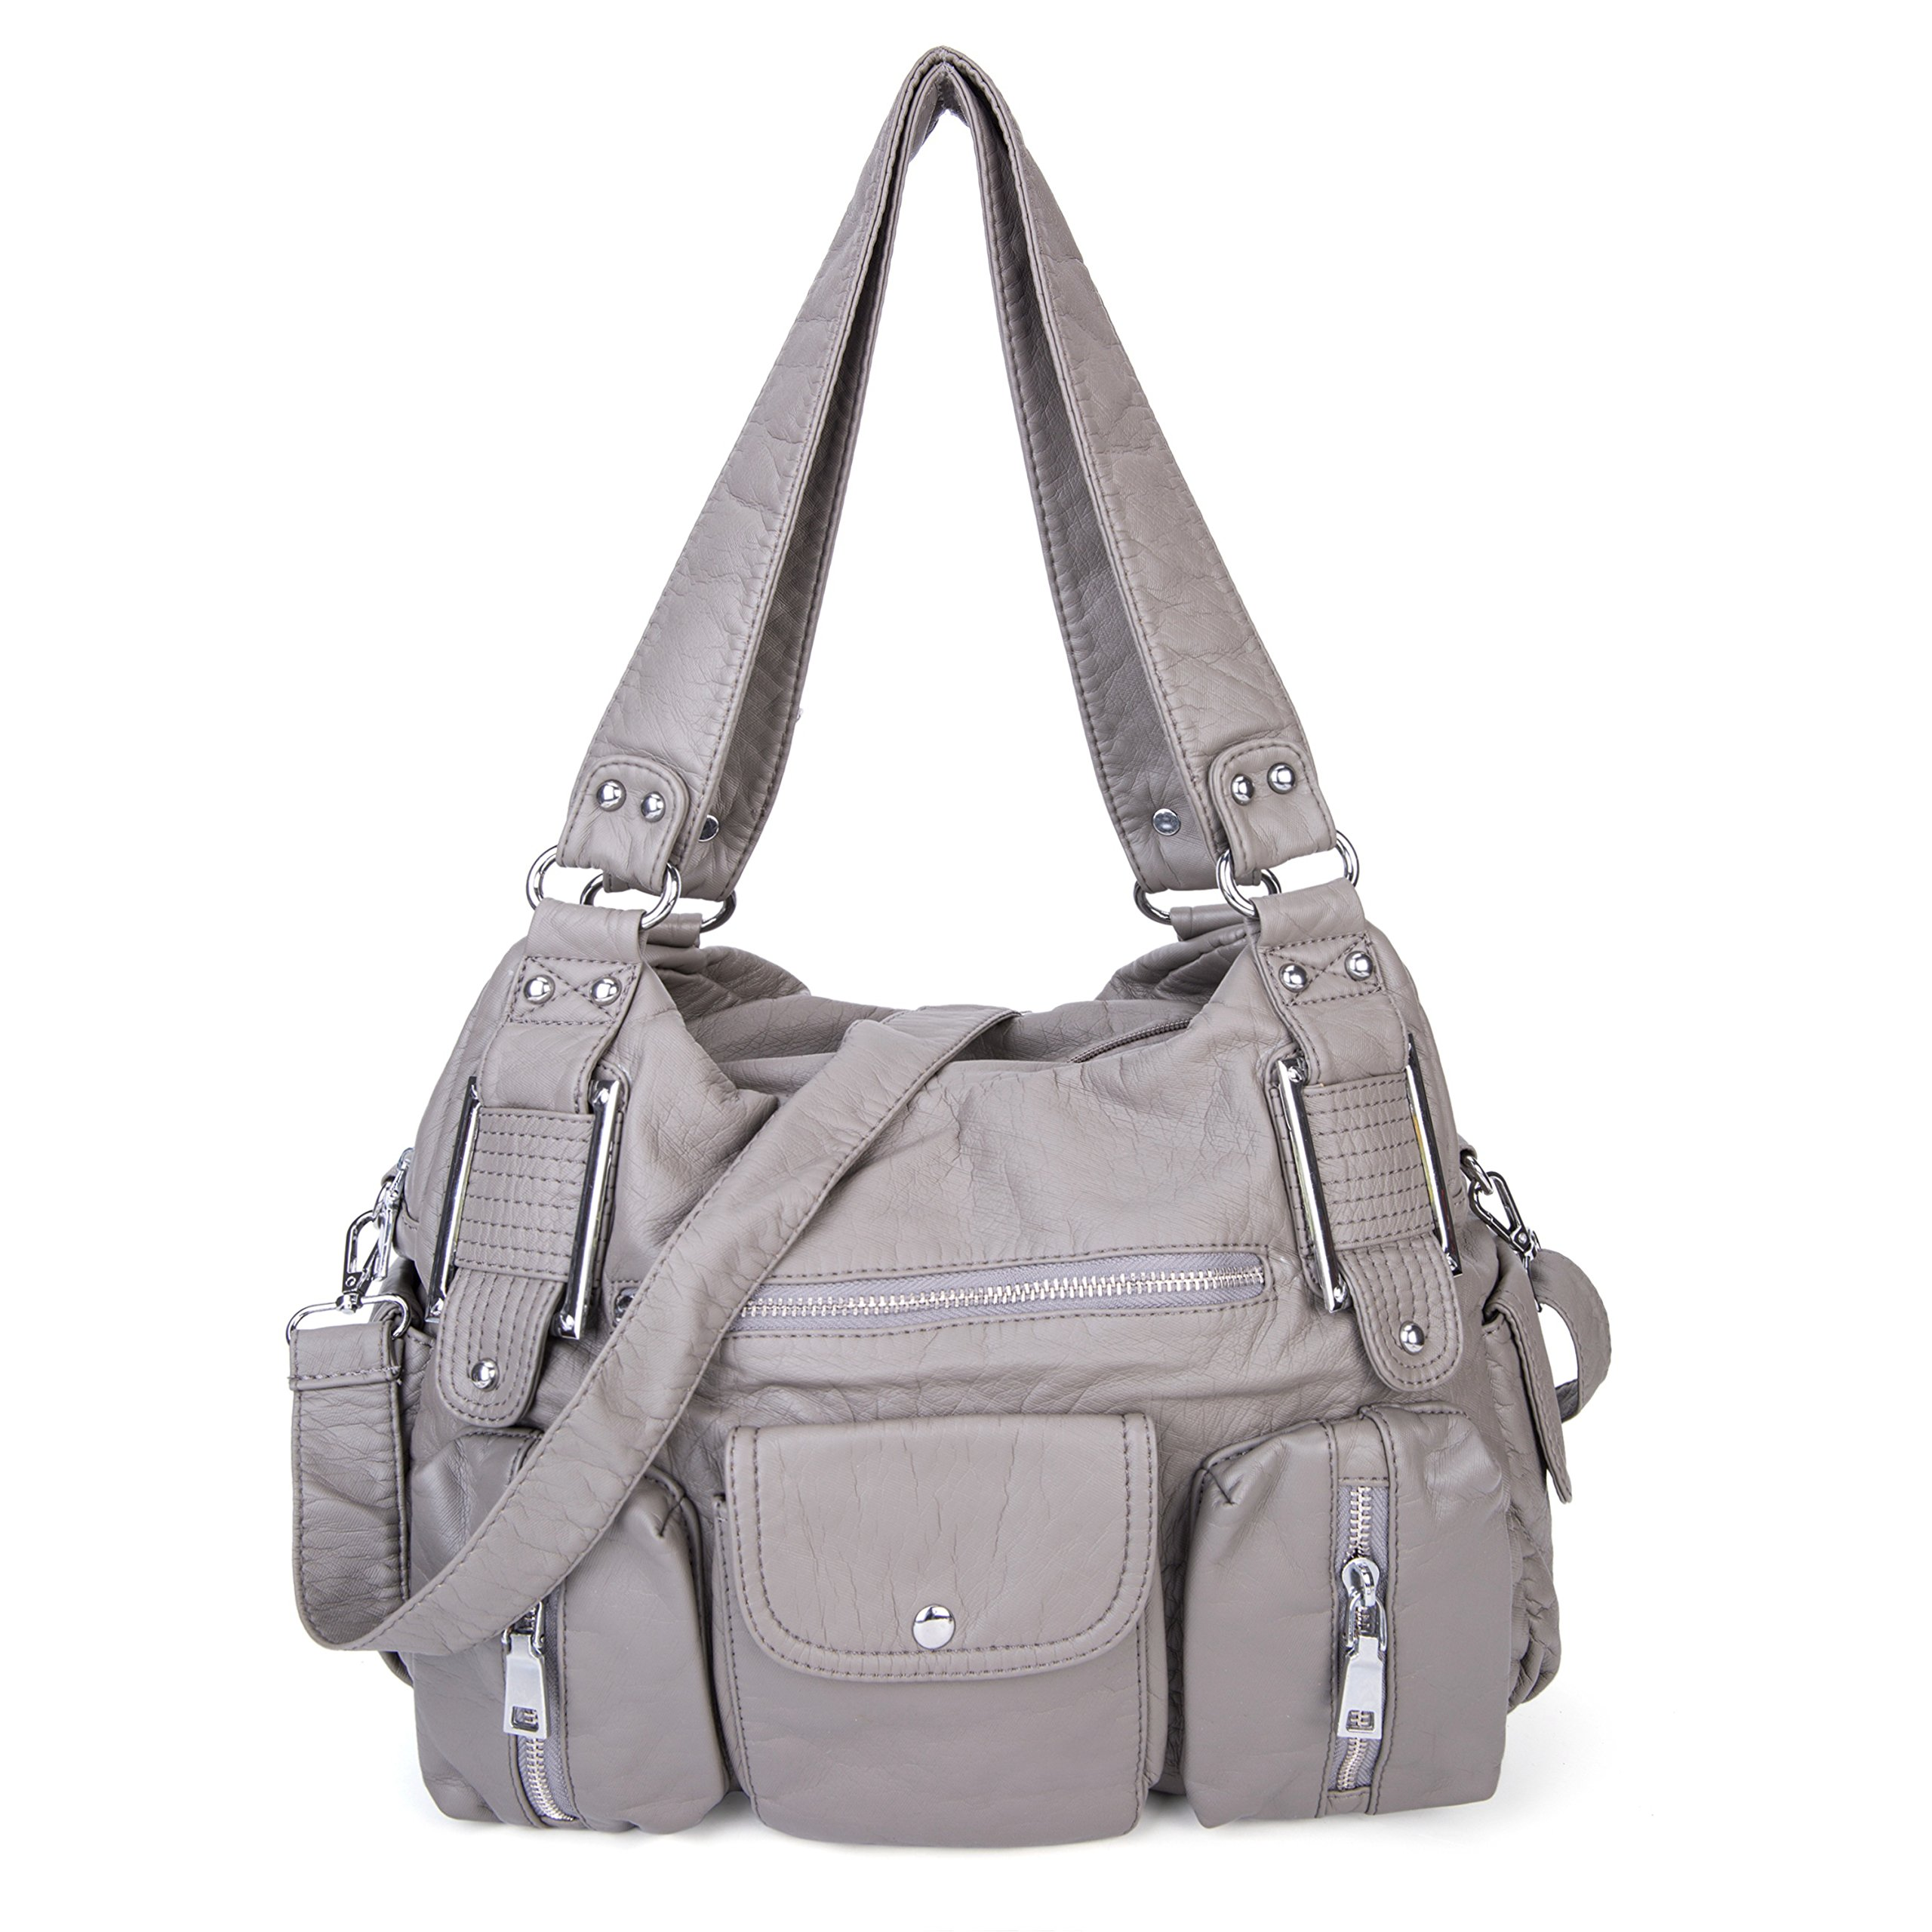 Shoulder Bag Purse Soft Large Capacity Tote Bag Washed PU Leather Cross Body Handbag for Women Gray